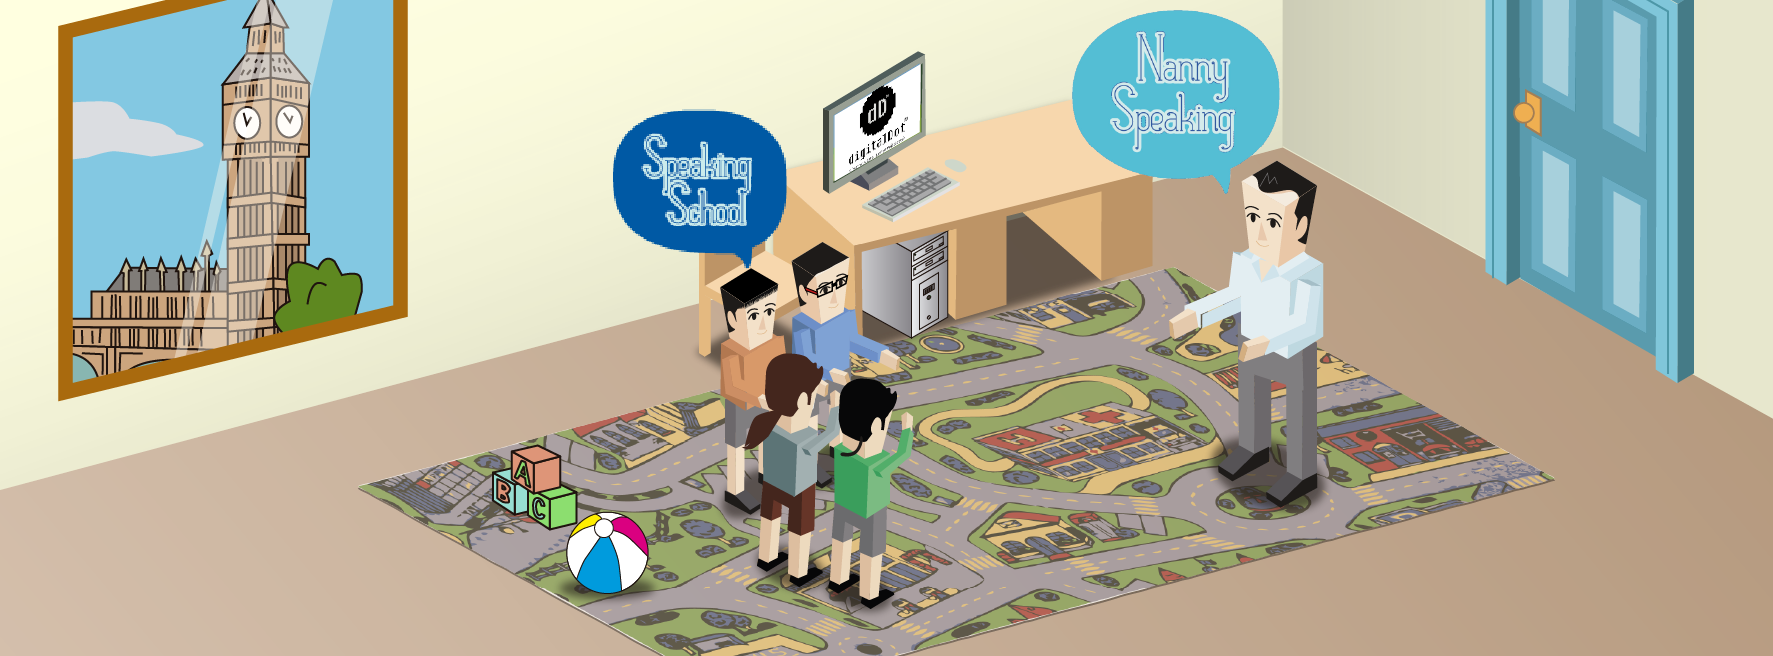 Desarrollo web Speaking School